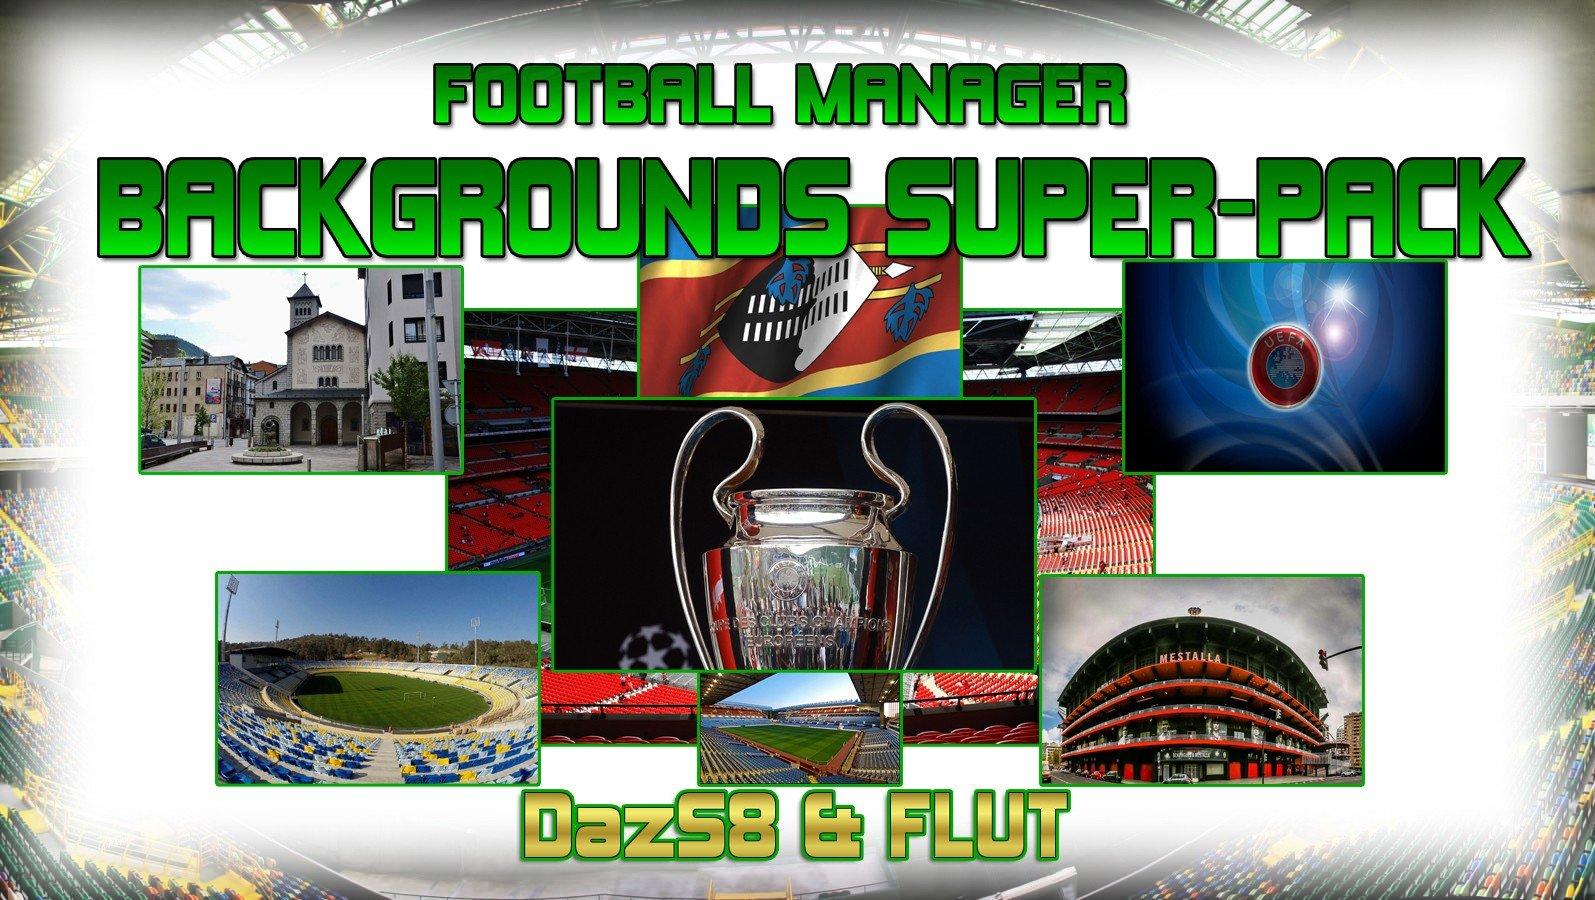 Backgrounds Super Pack (FM2016) 3NEWD